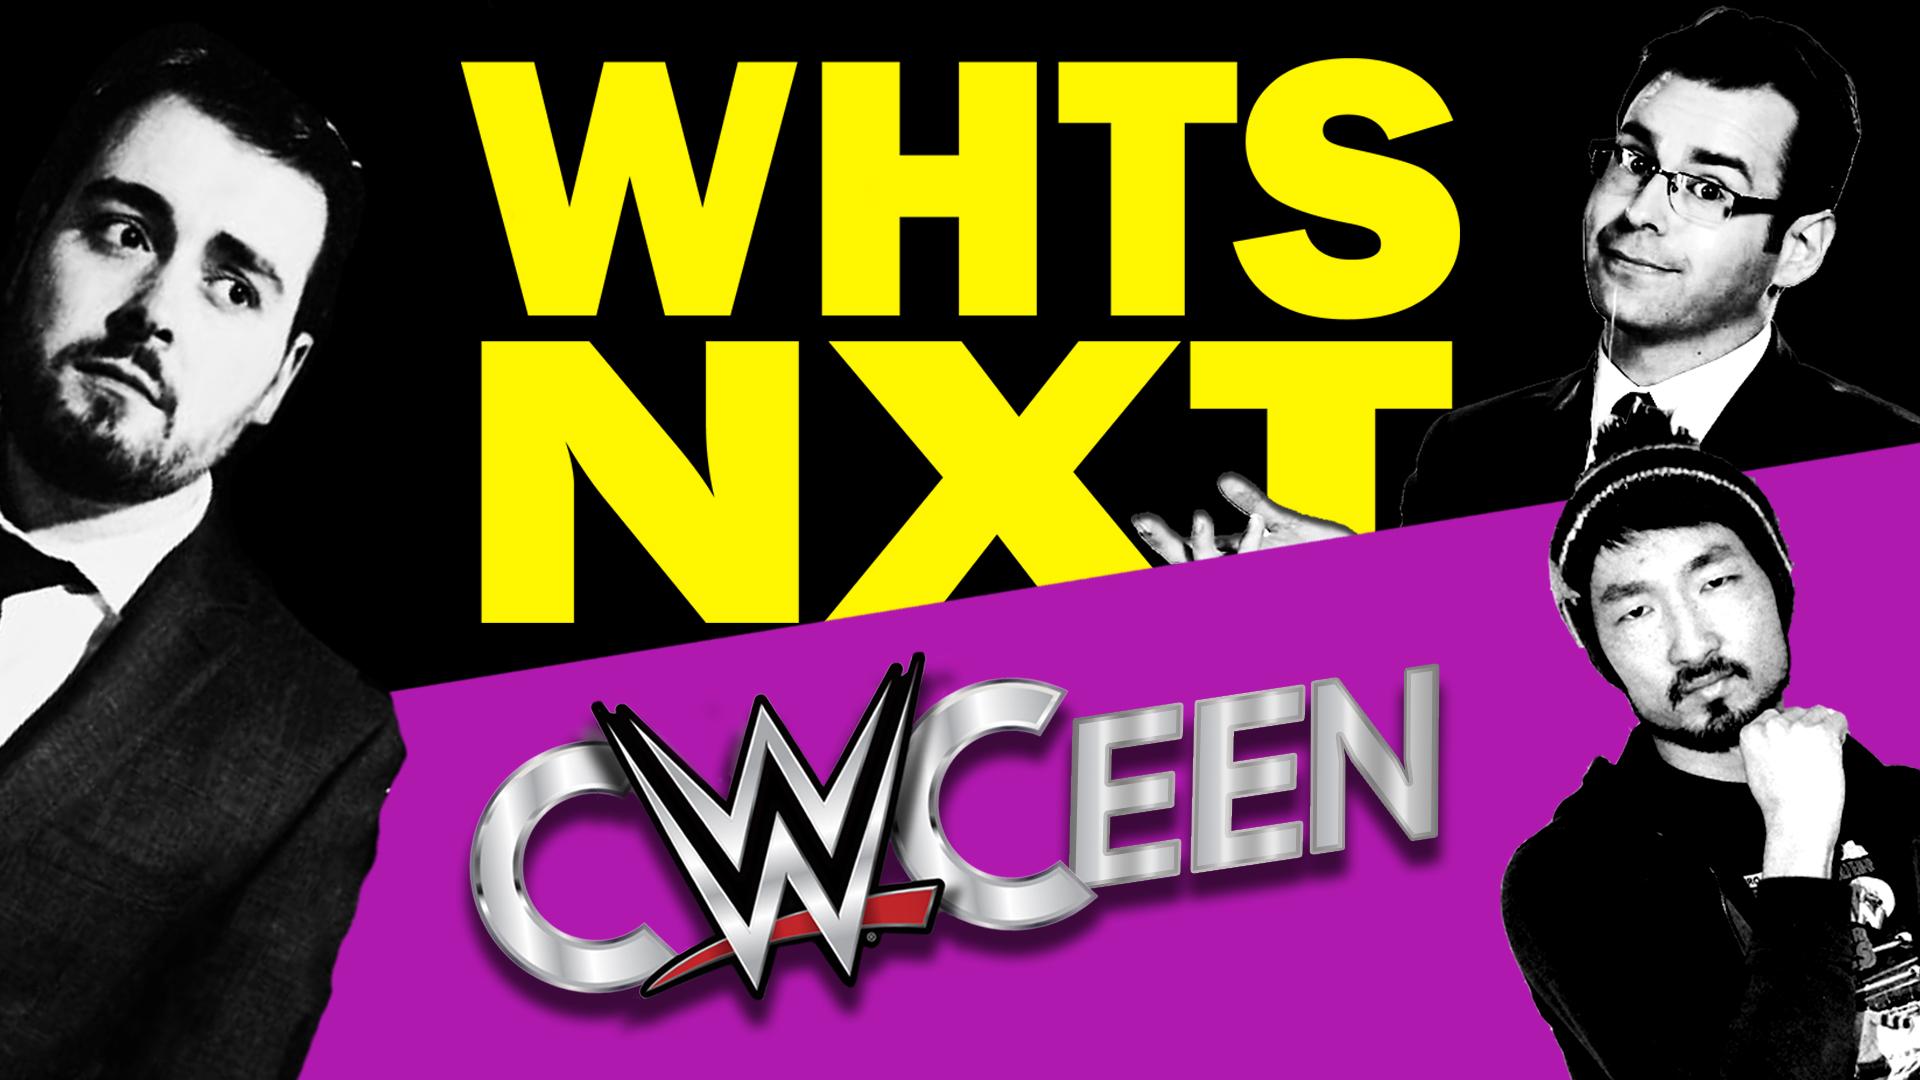 whtsNXT CWCeen